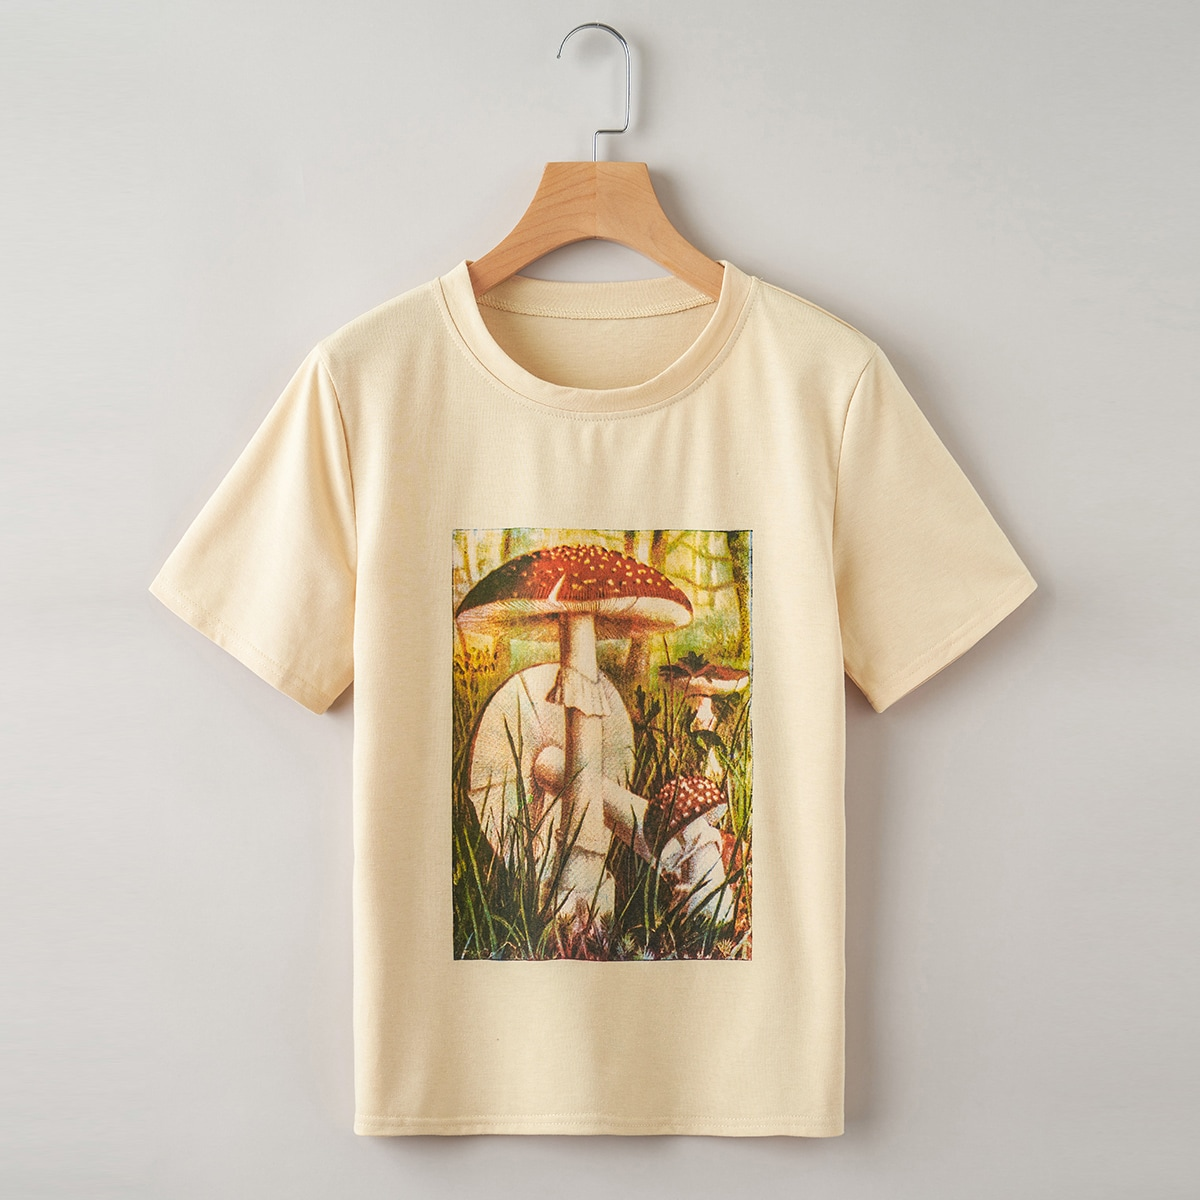 Plus Mushroom Print Short Sleeve Tee, SHEIN  - buy with discount